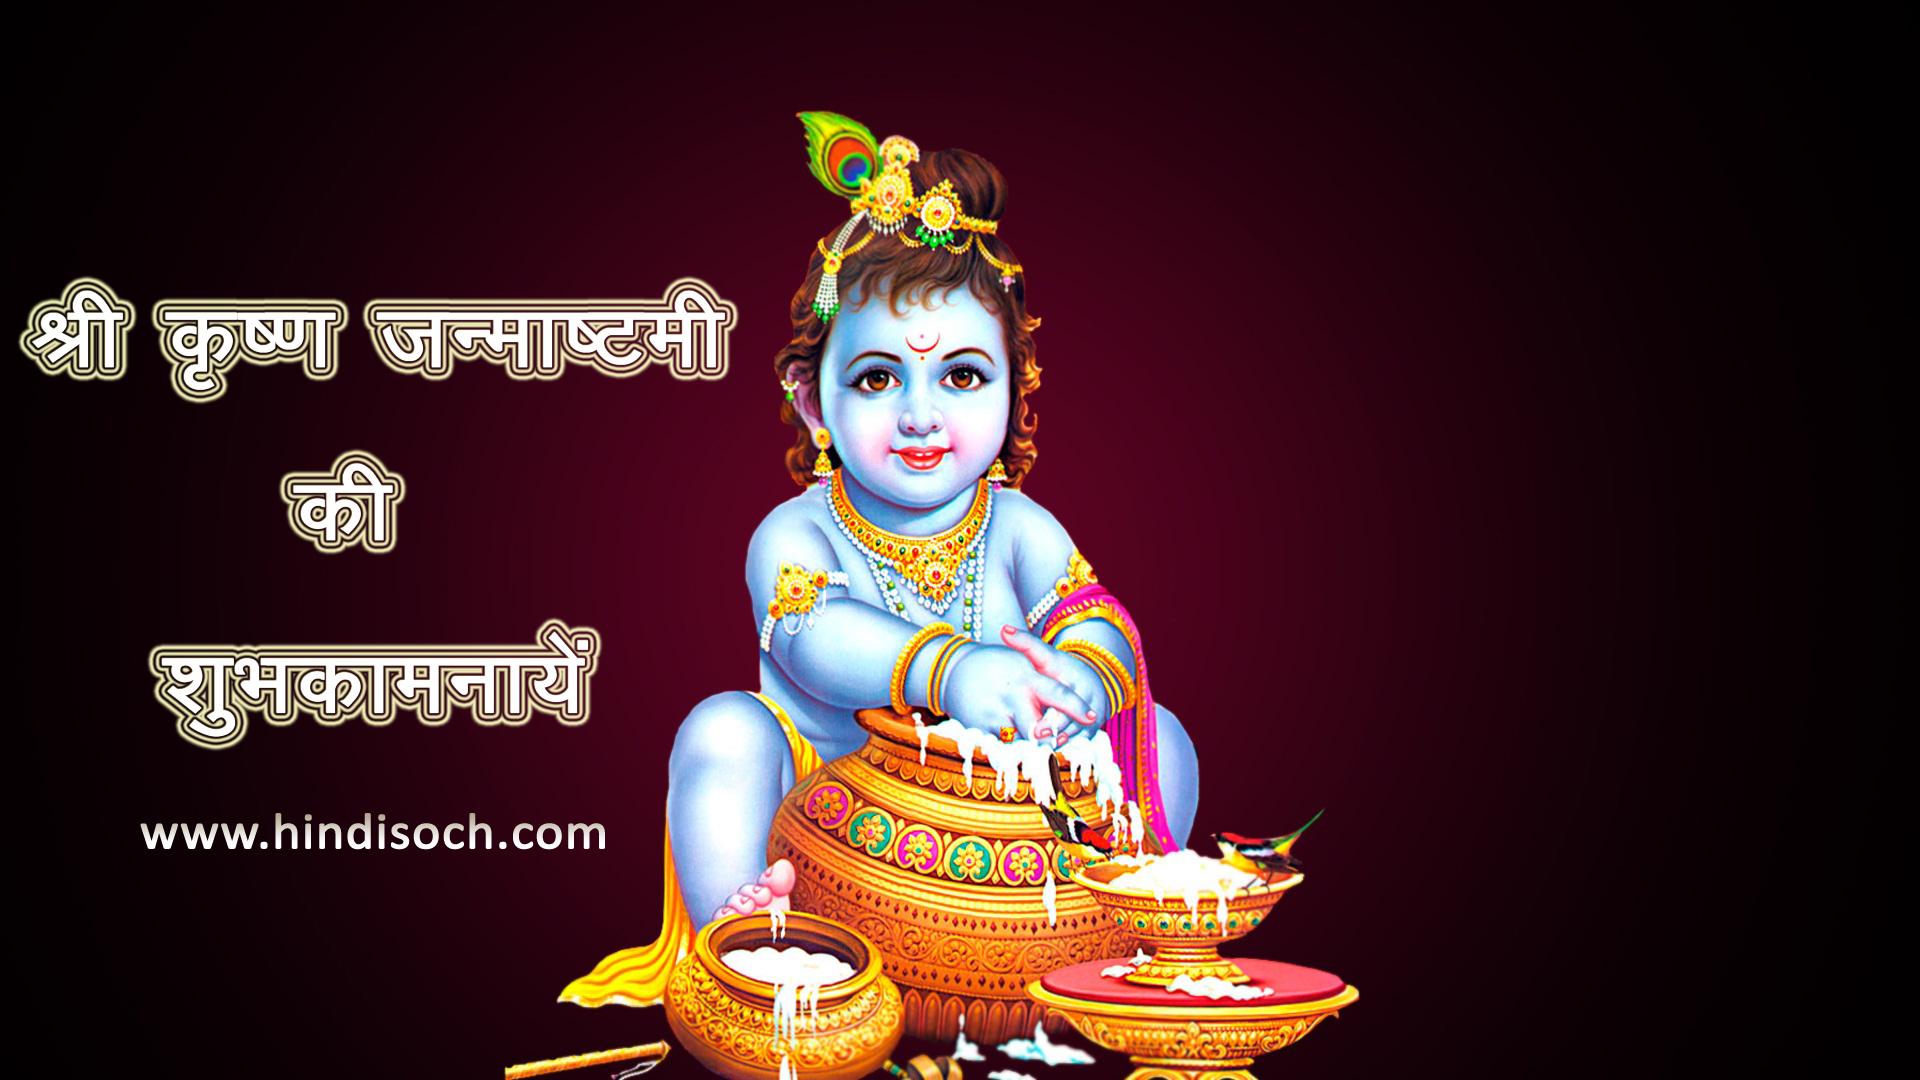 Wallpaper download krishna - Janmashtami Images Wallpapers